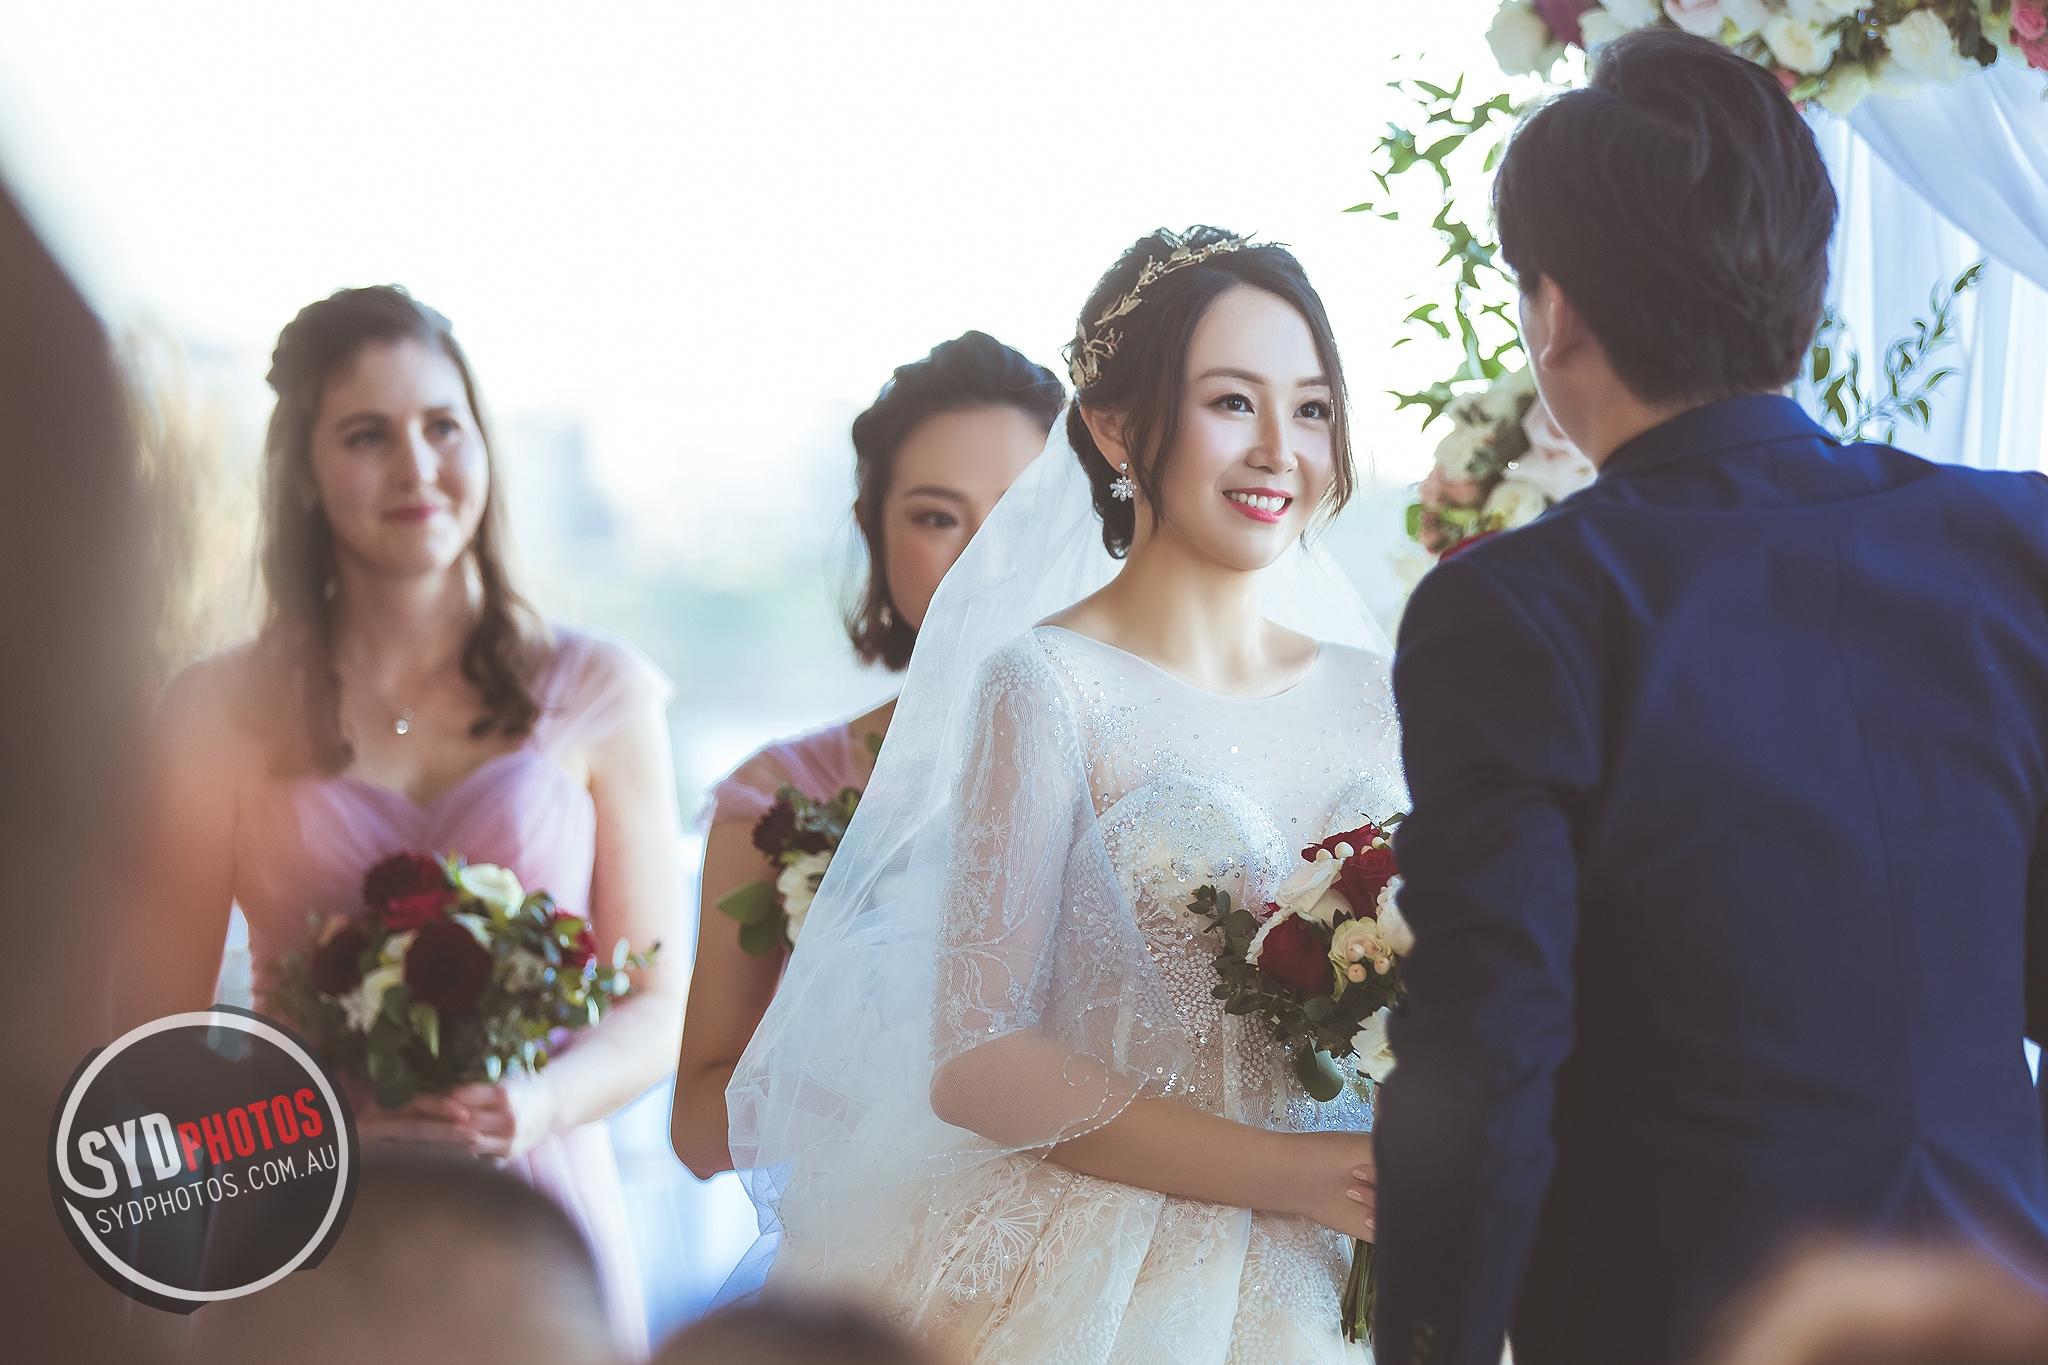 ID-107098-Christine-婚礼-wedding